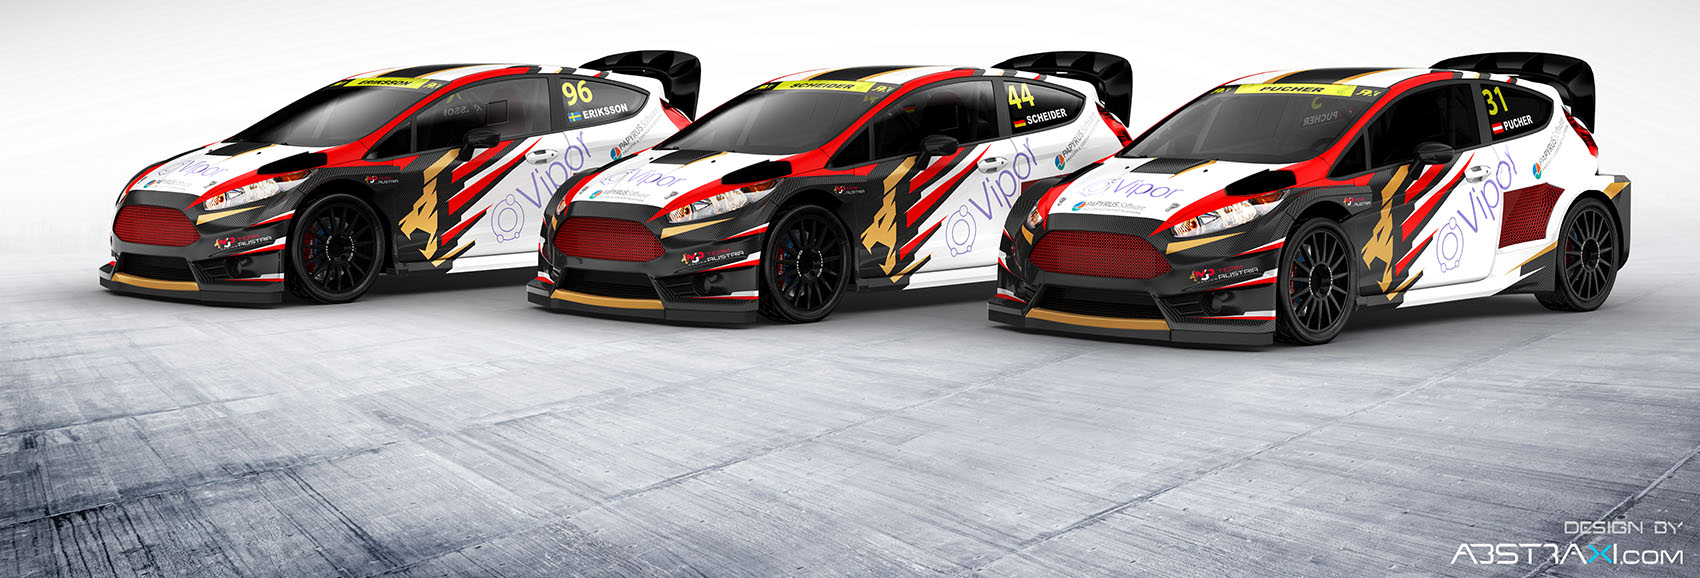 MJP Racing unveils liveries for 2017 World Rallycross Championship ...